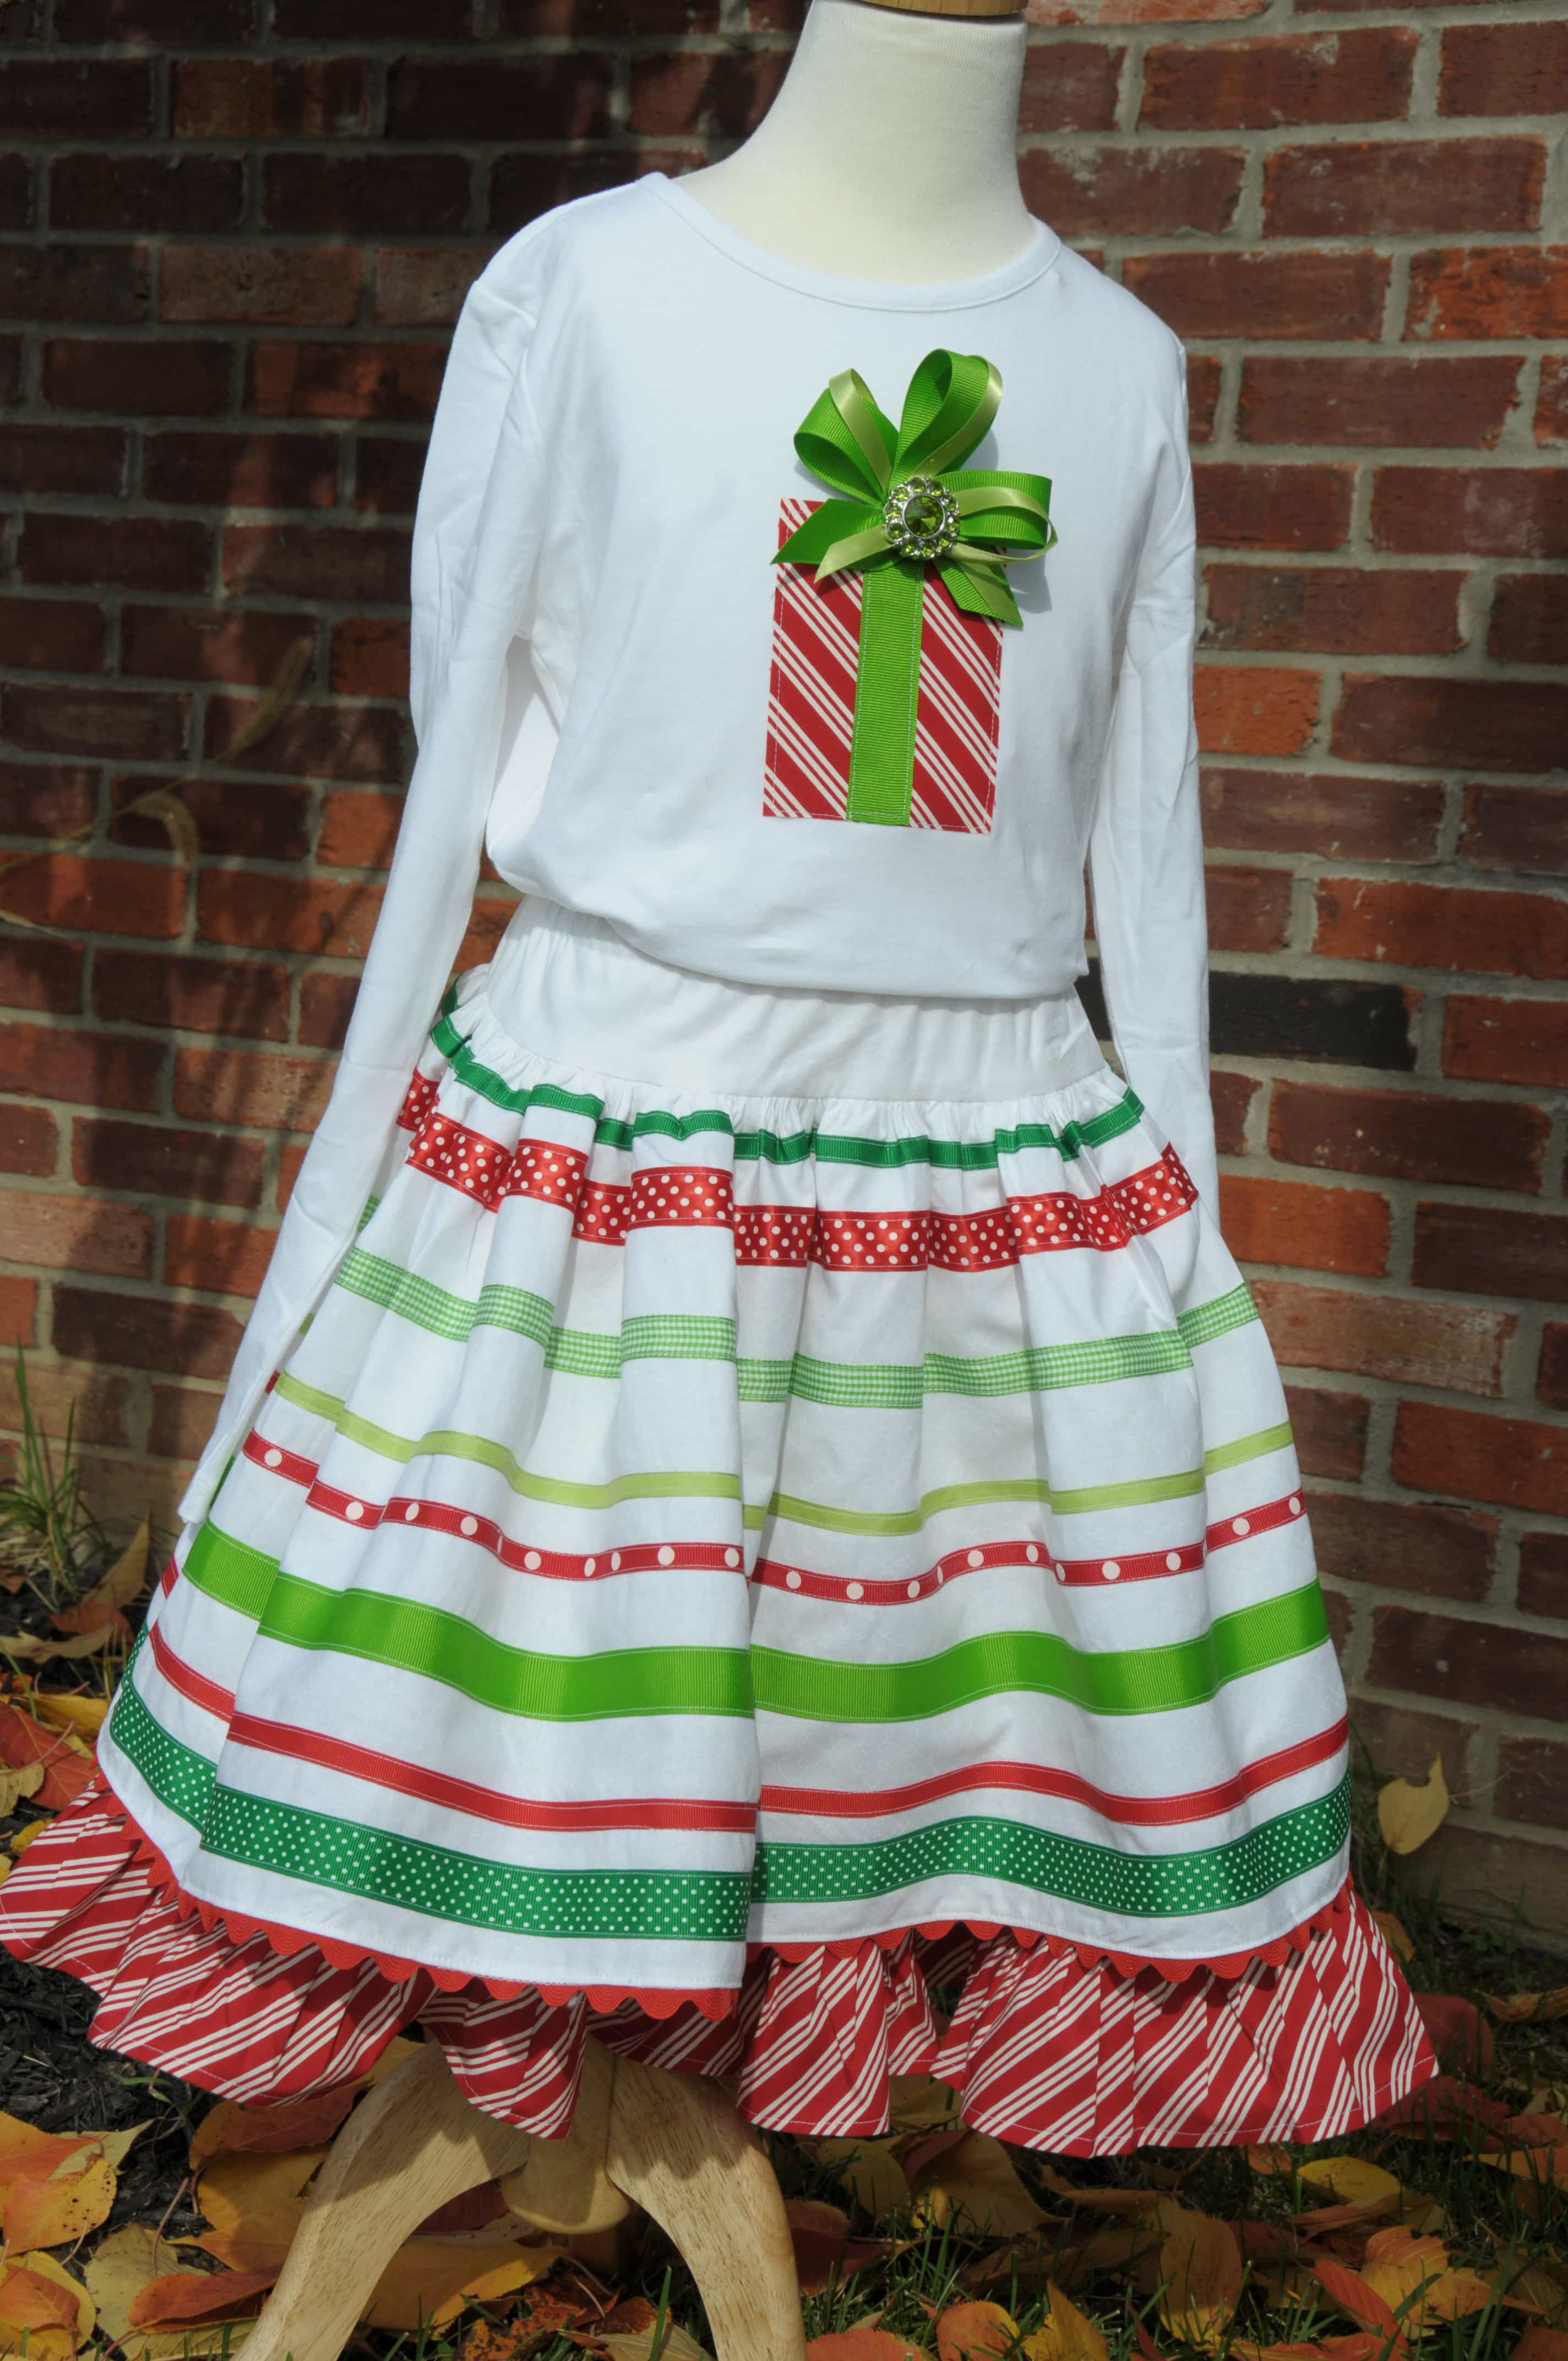 Ribbon Skirt Sewing Tutorial Embellished T Shirt Tutorial